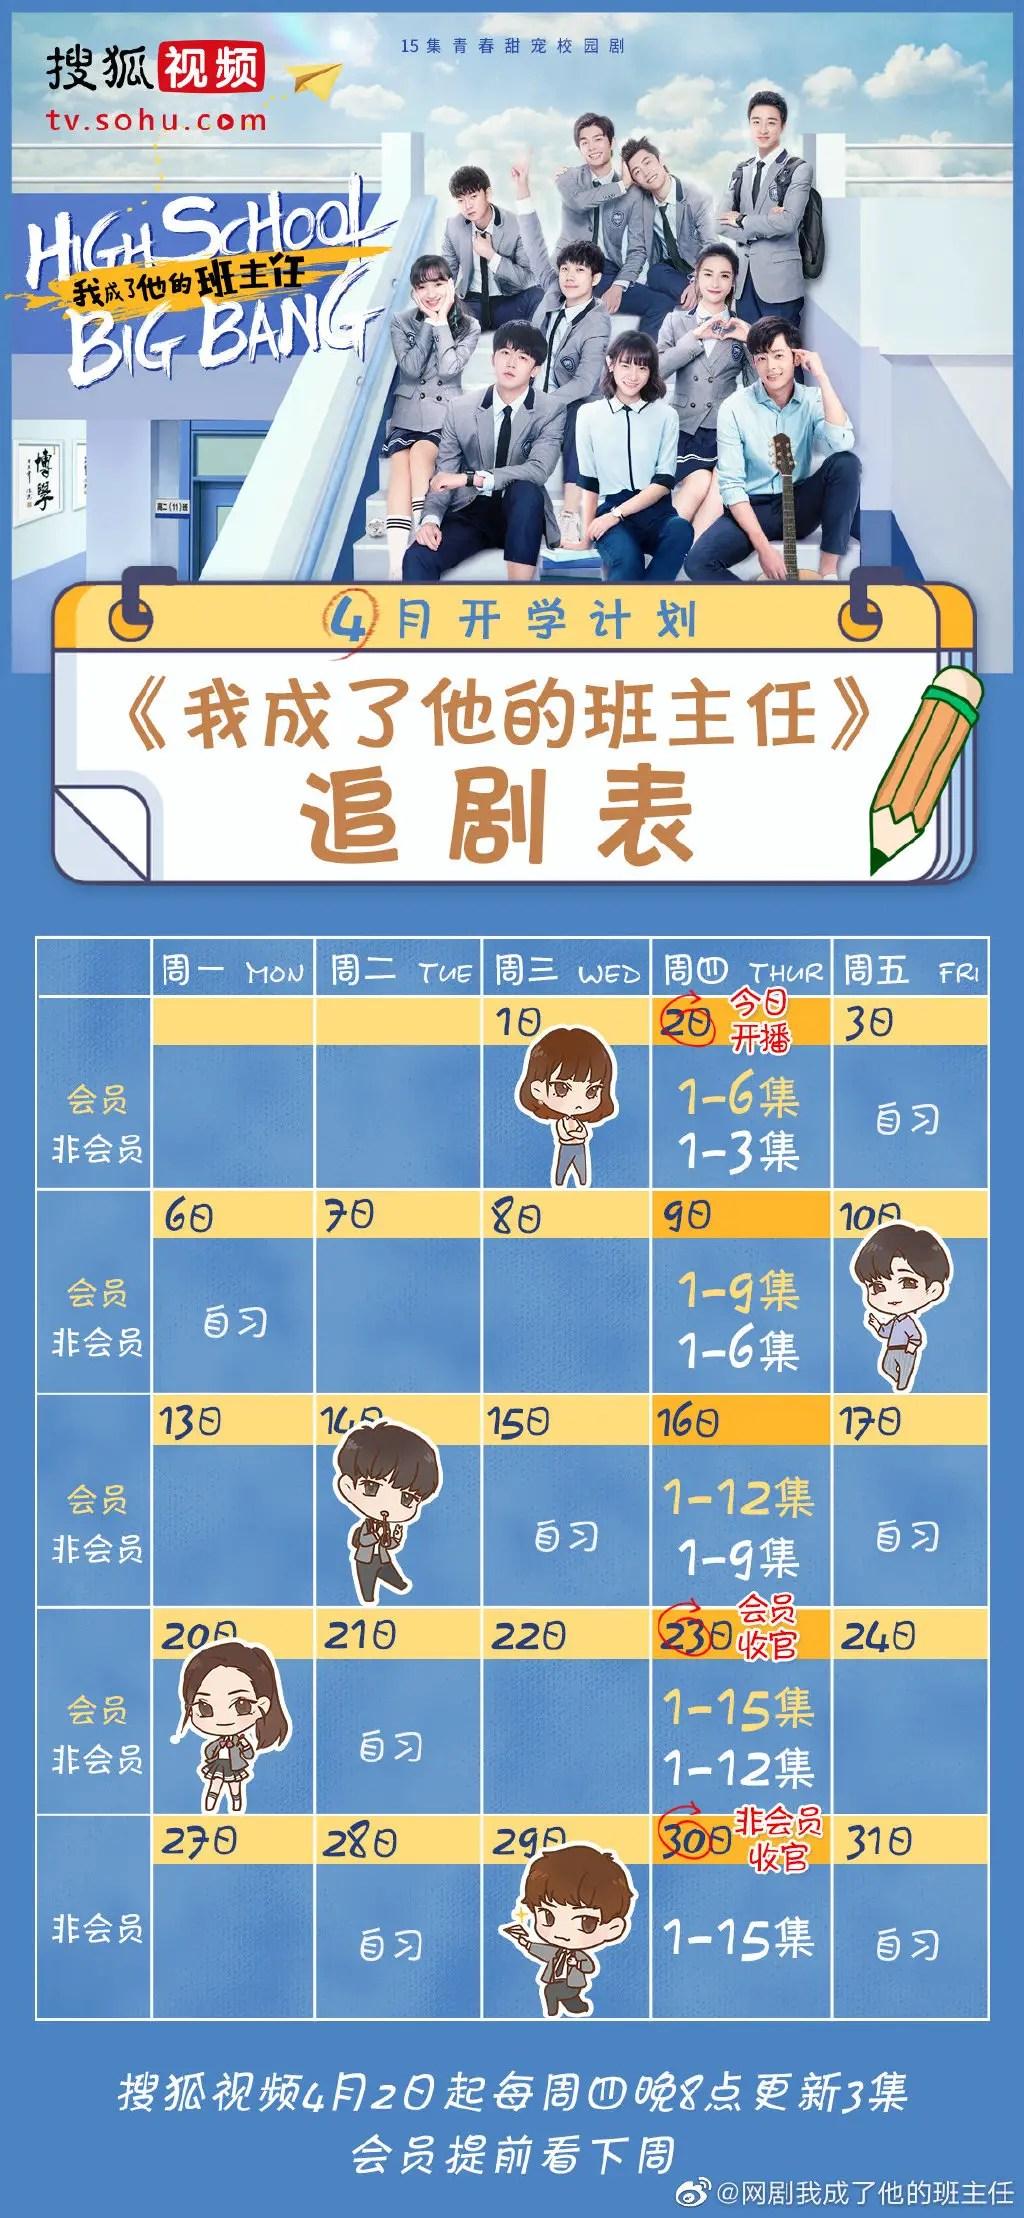 High School Big Bang Airing Calendar